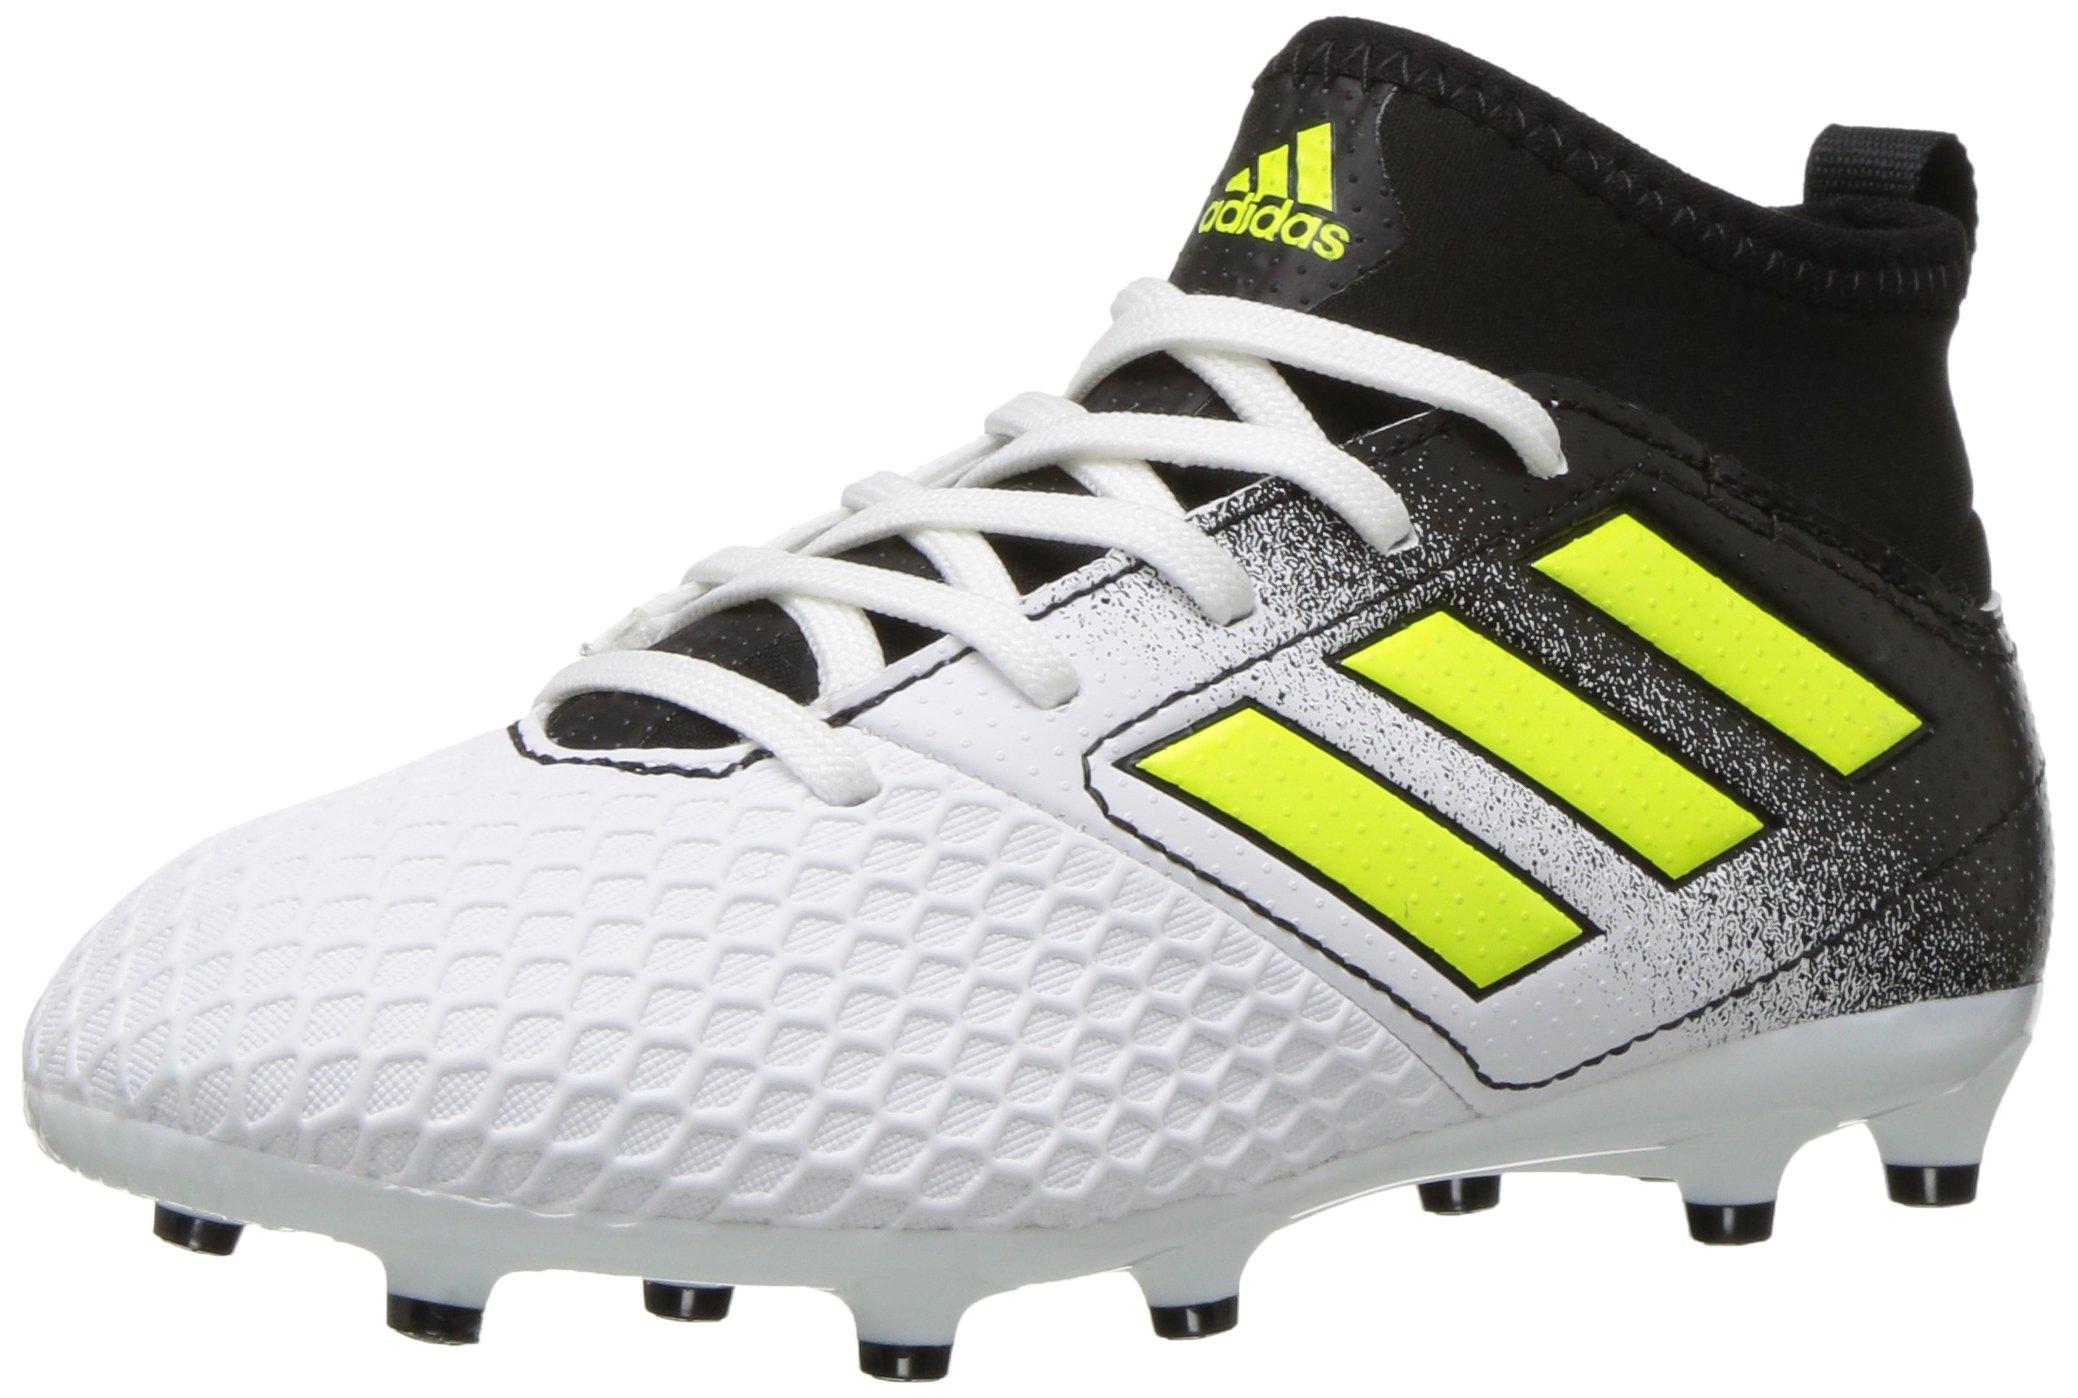 c33bb6725 Galleon - Adidas Performance Boys  Ace 17.3 FG J